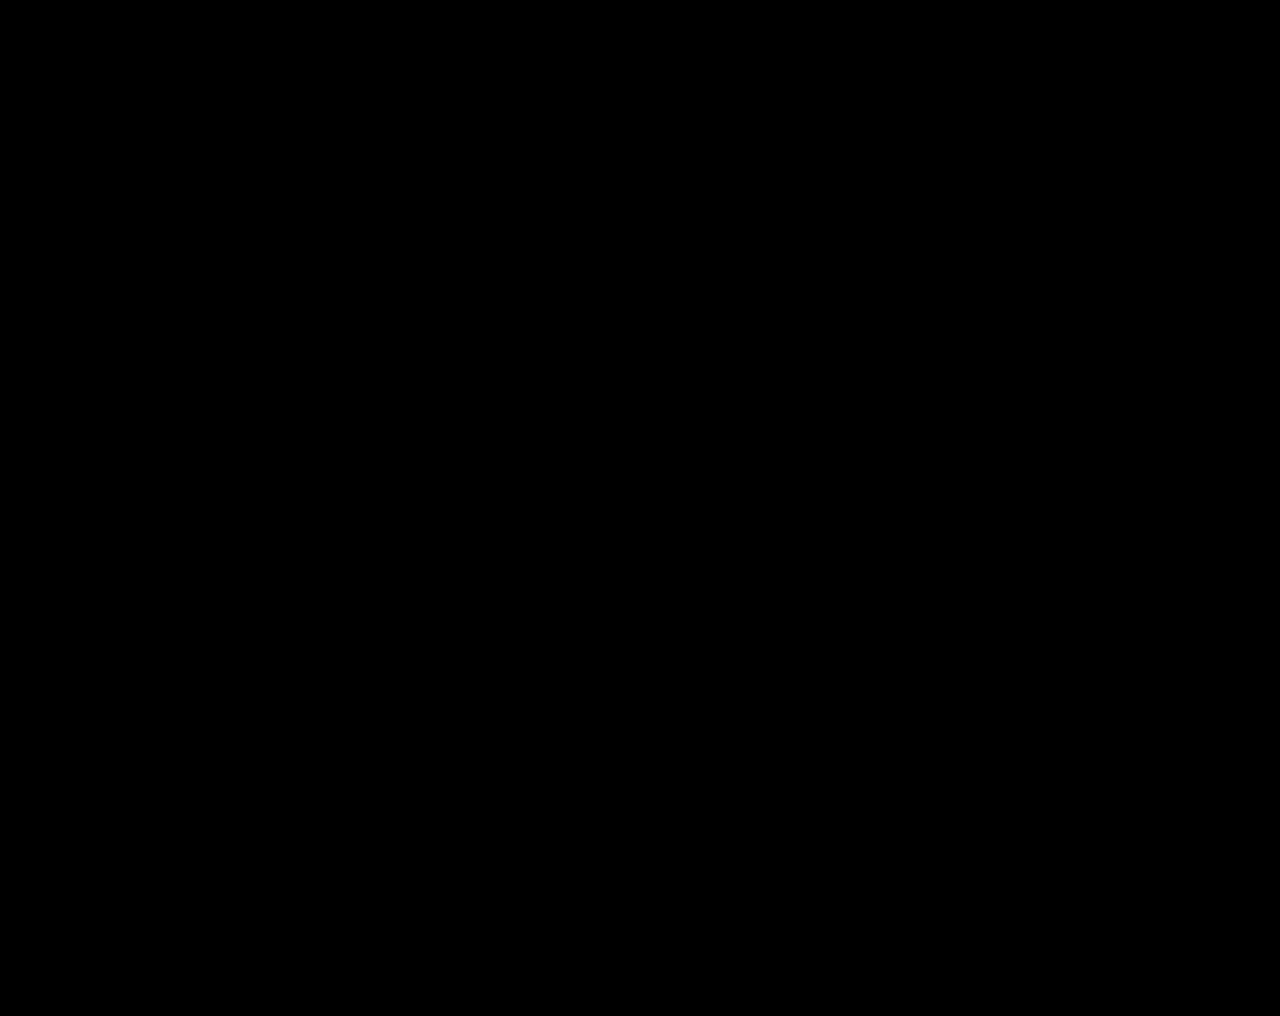 Crabs clipart vector. Crab silhouette clip art